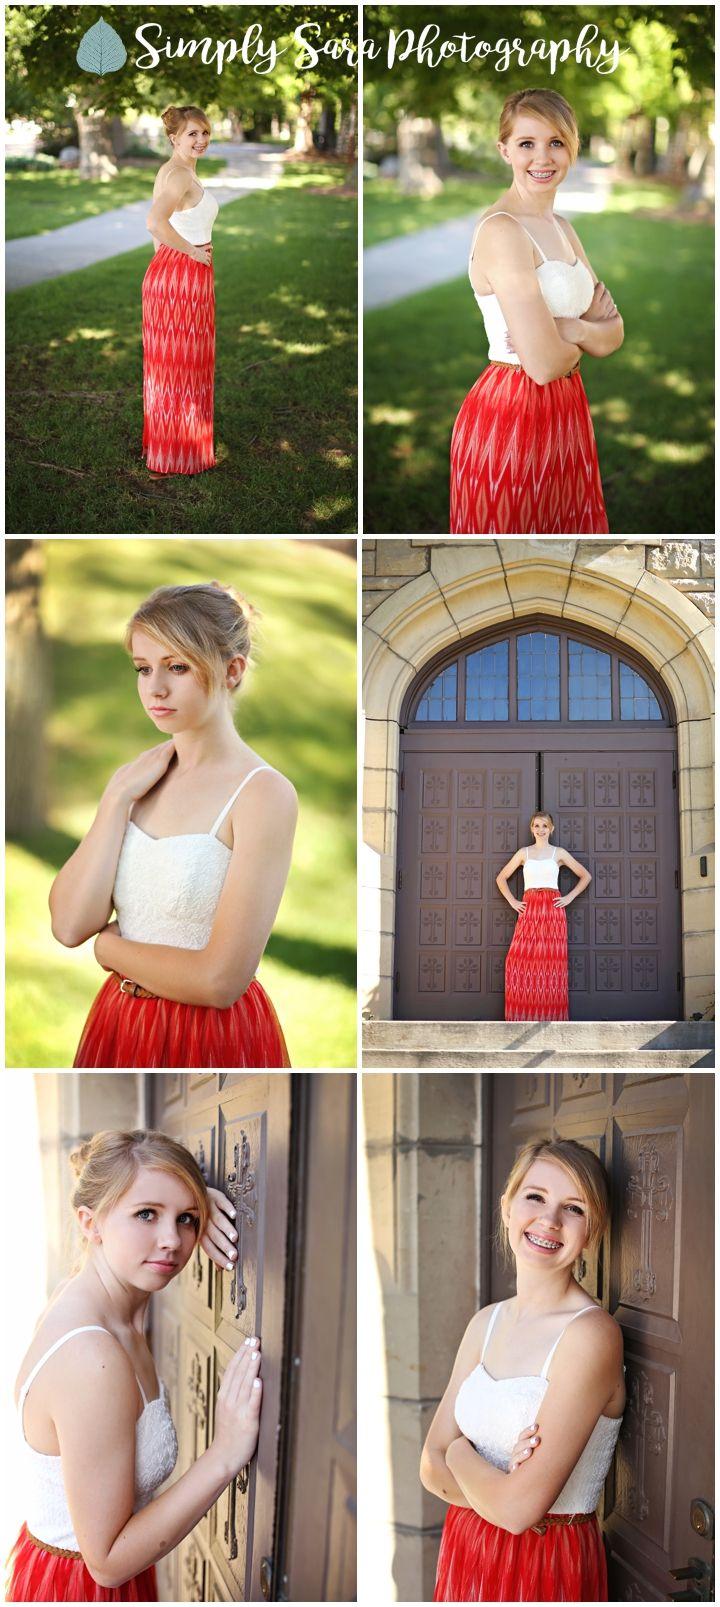 Senior Portrait Photos & Poses for Girls - Outdoor Photo Shoot - Billings, Montana High School Senior Portrait Photographer